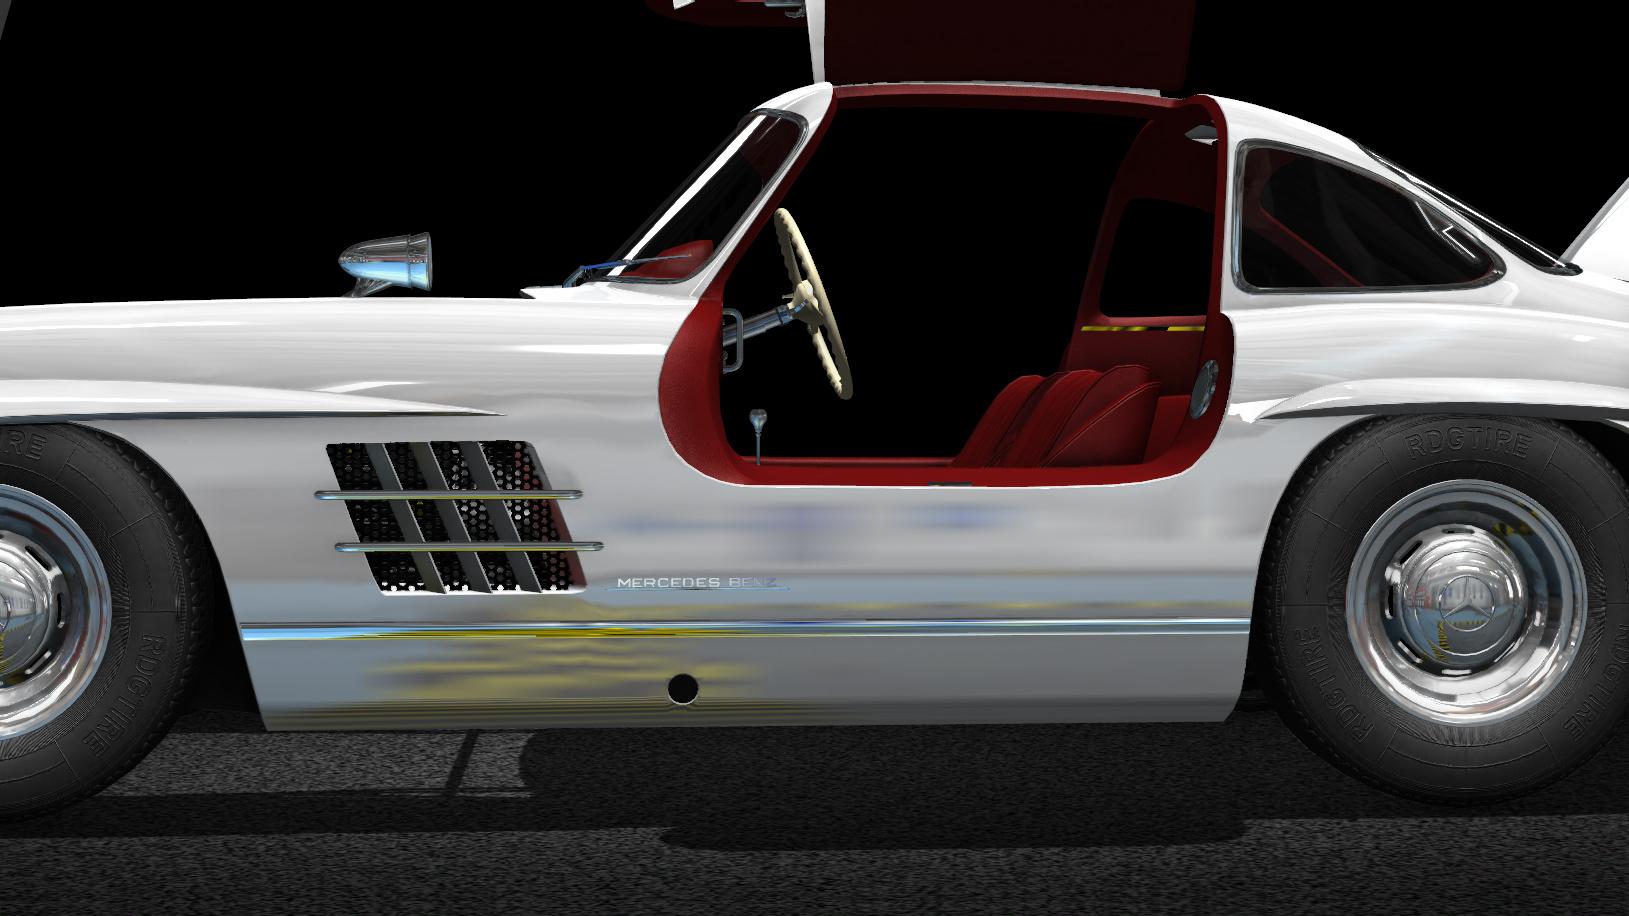 Car mechanic simulator 2015 mercedes benz dlc 39 si kt for Mercedes benz mechanic